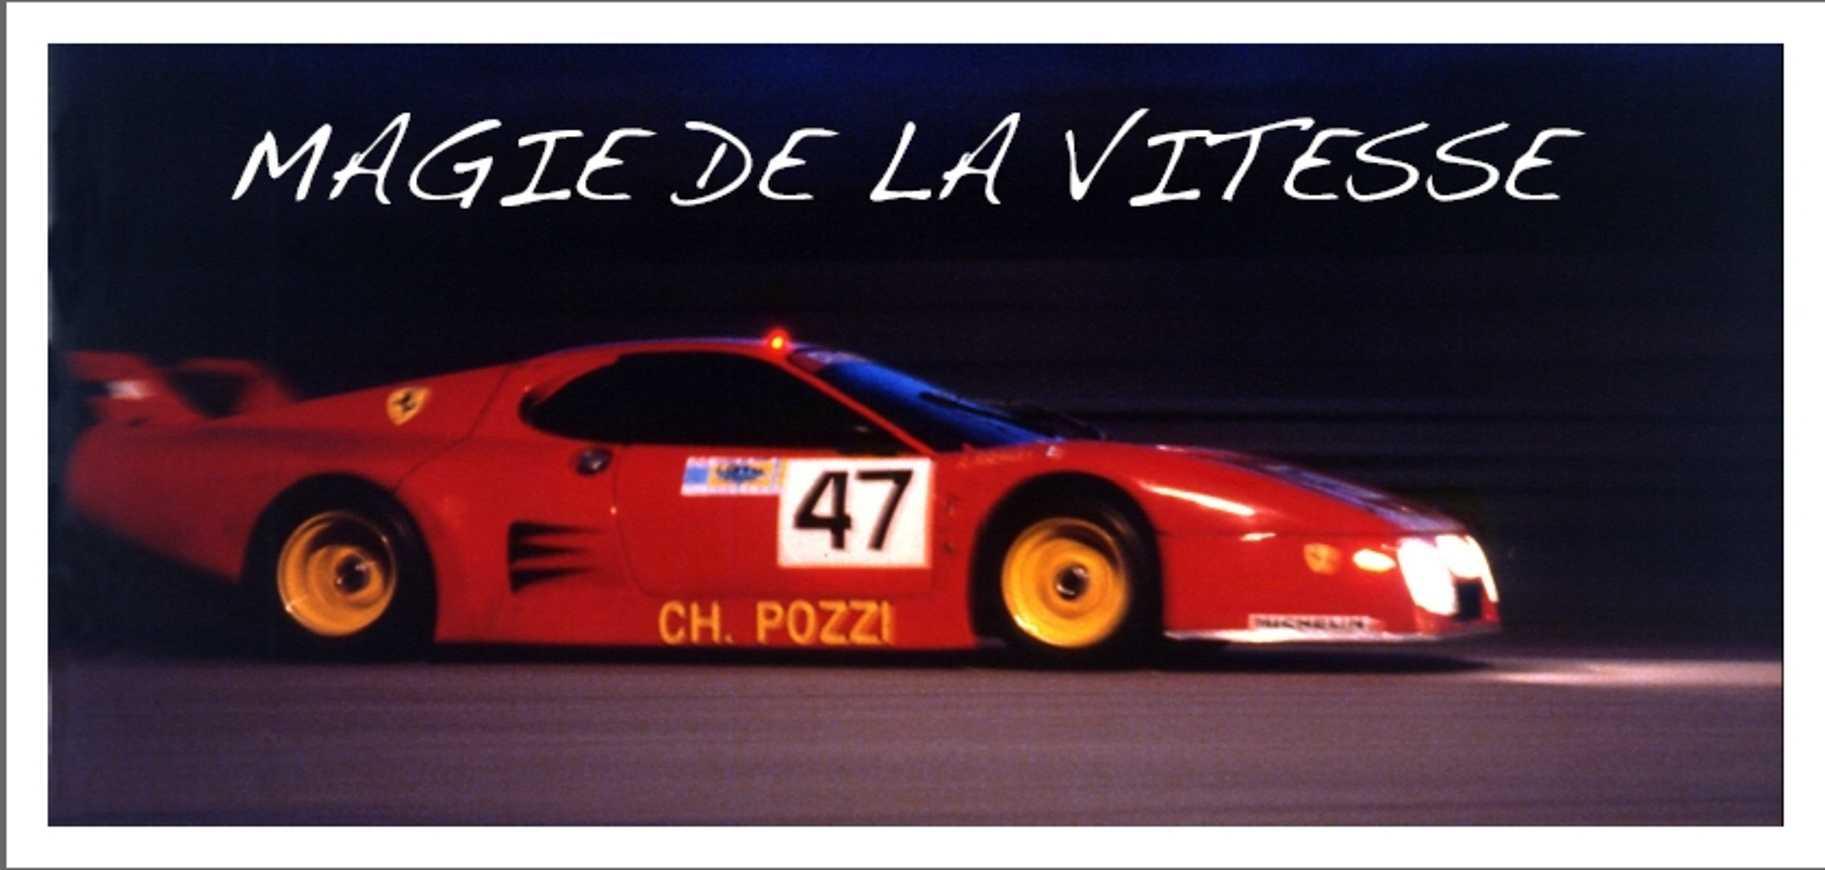 """Magie de la vitesse"" : exposition de Jean Pierre Corbel 0"